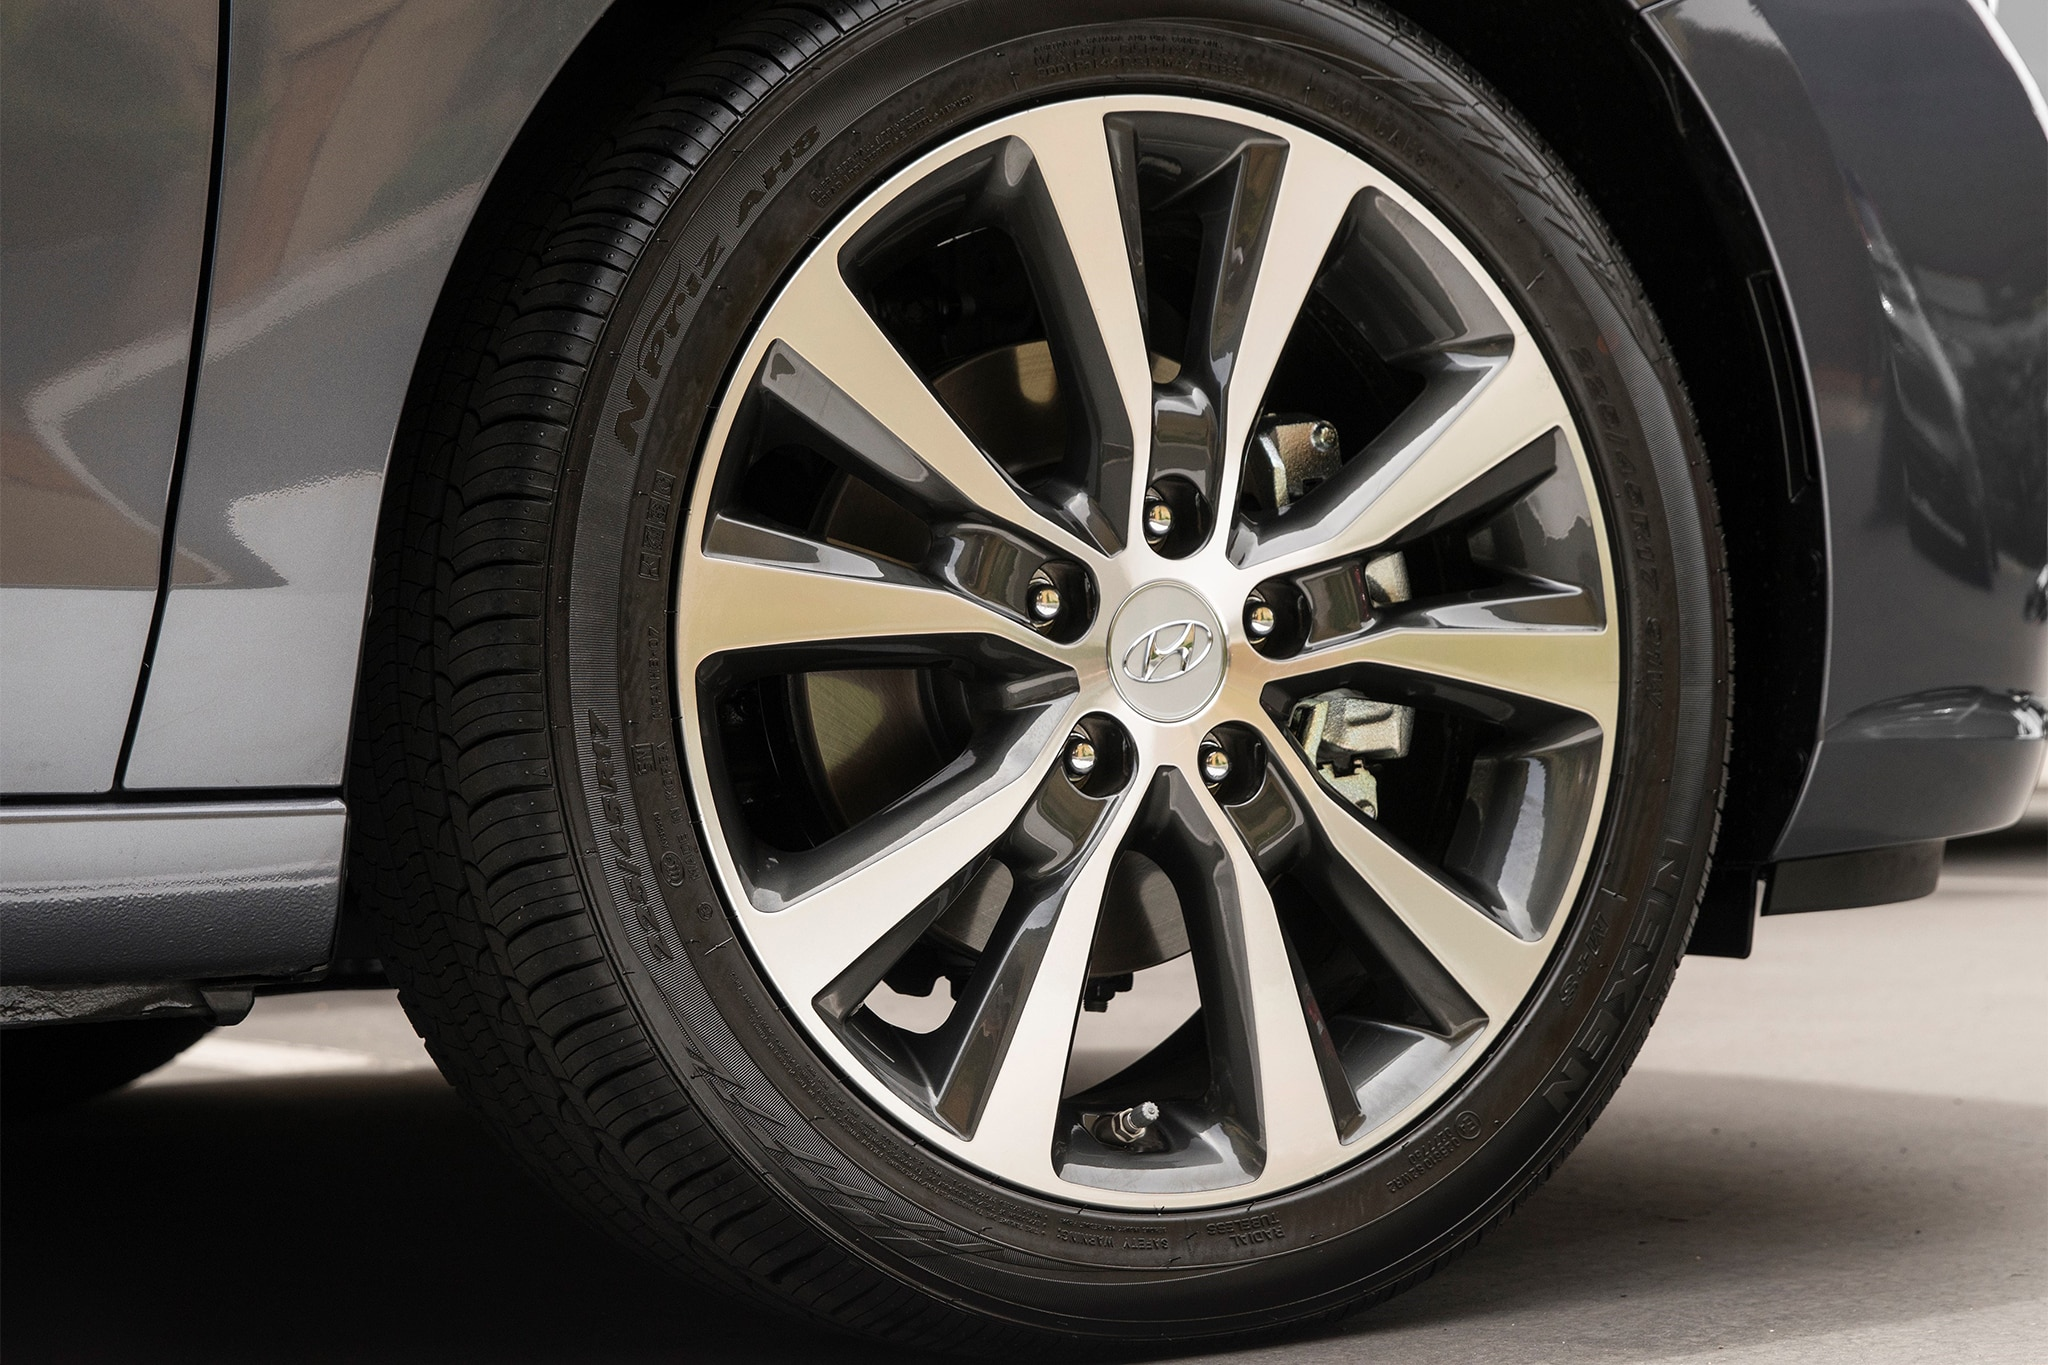 2018-Hyundai-Elantra-GT-wheel.jpg